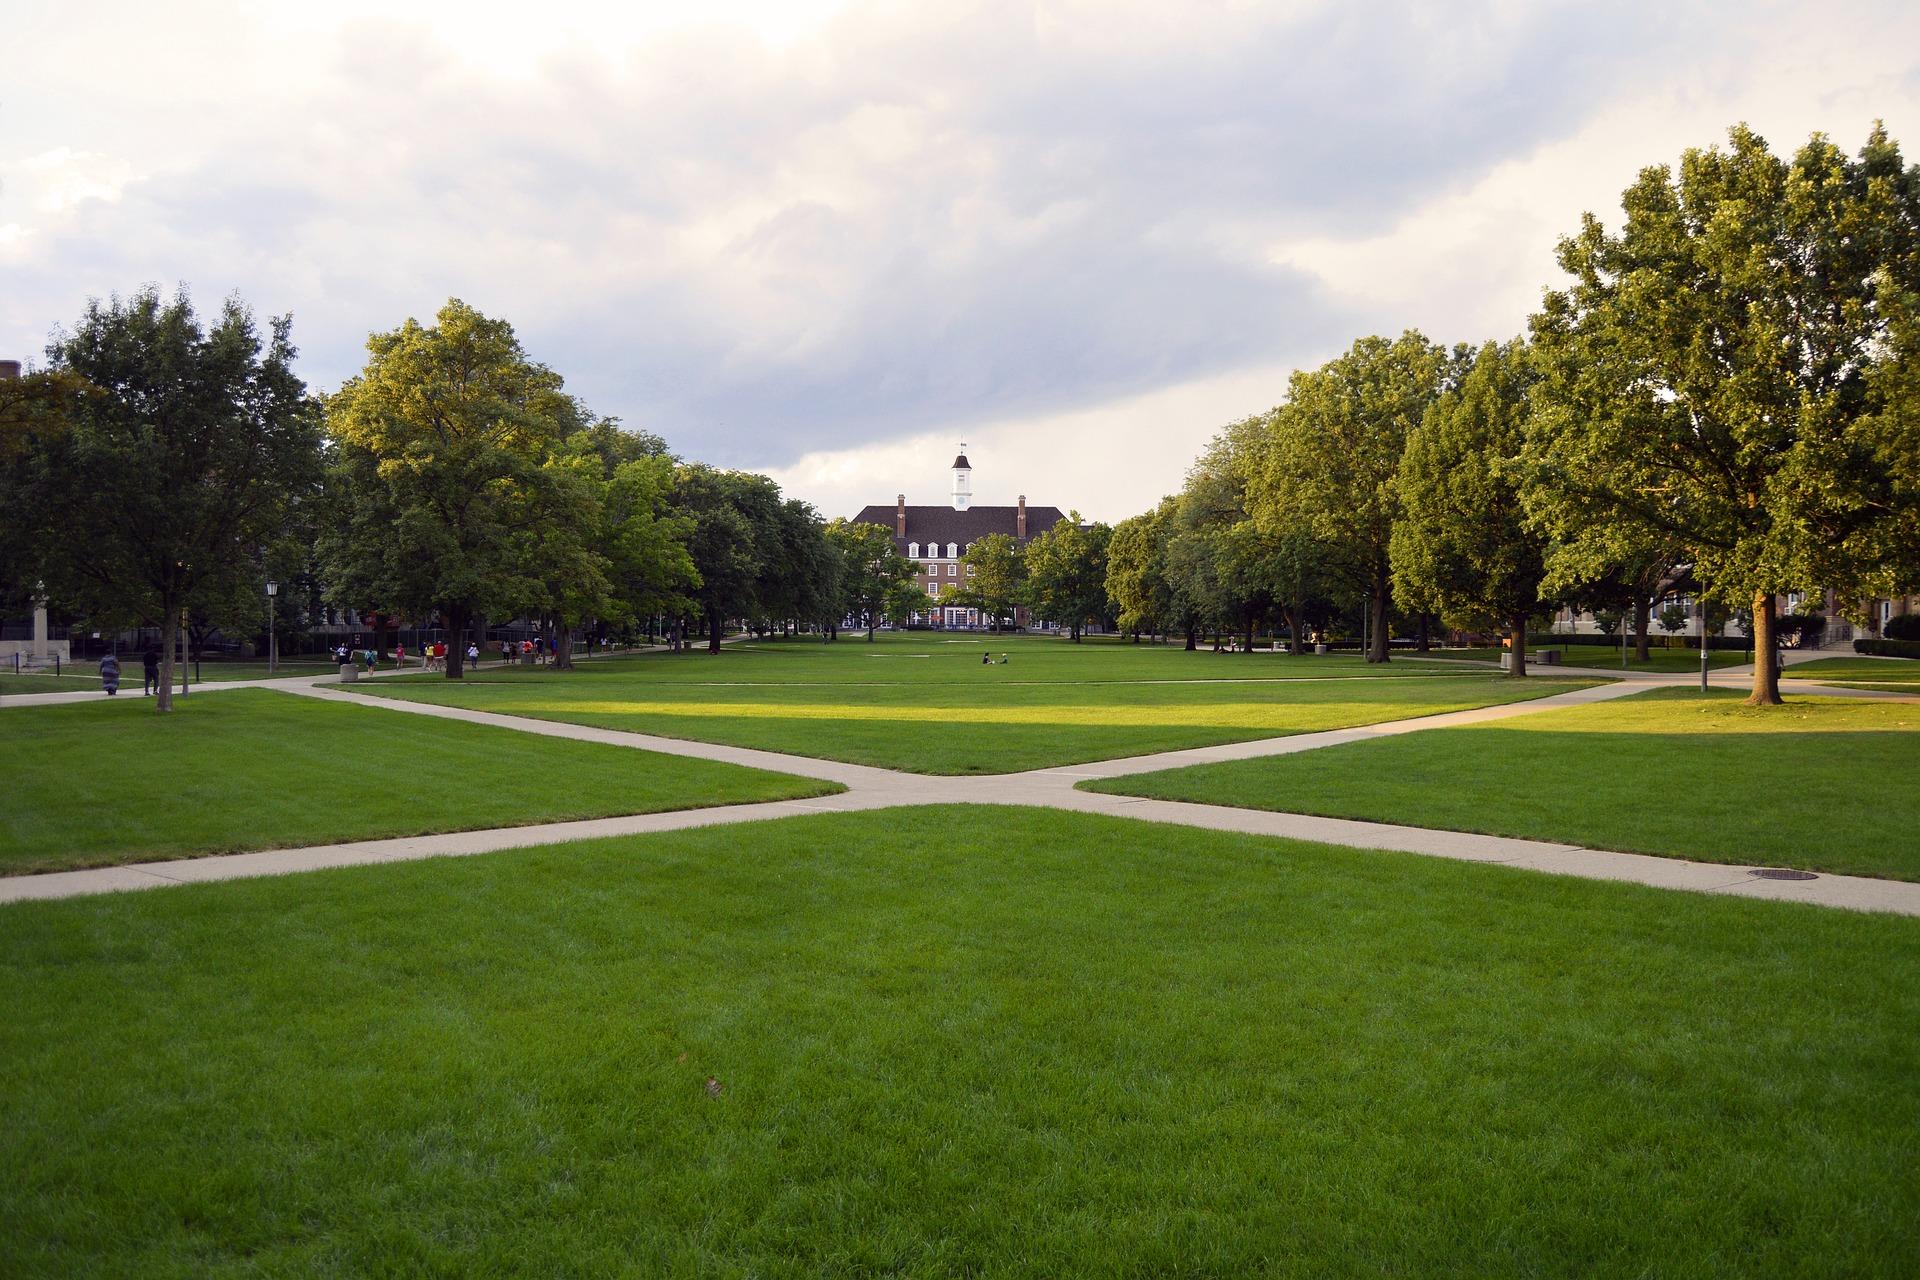 university-2540633_1920.jpg